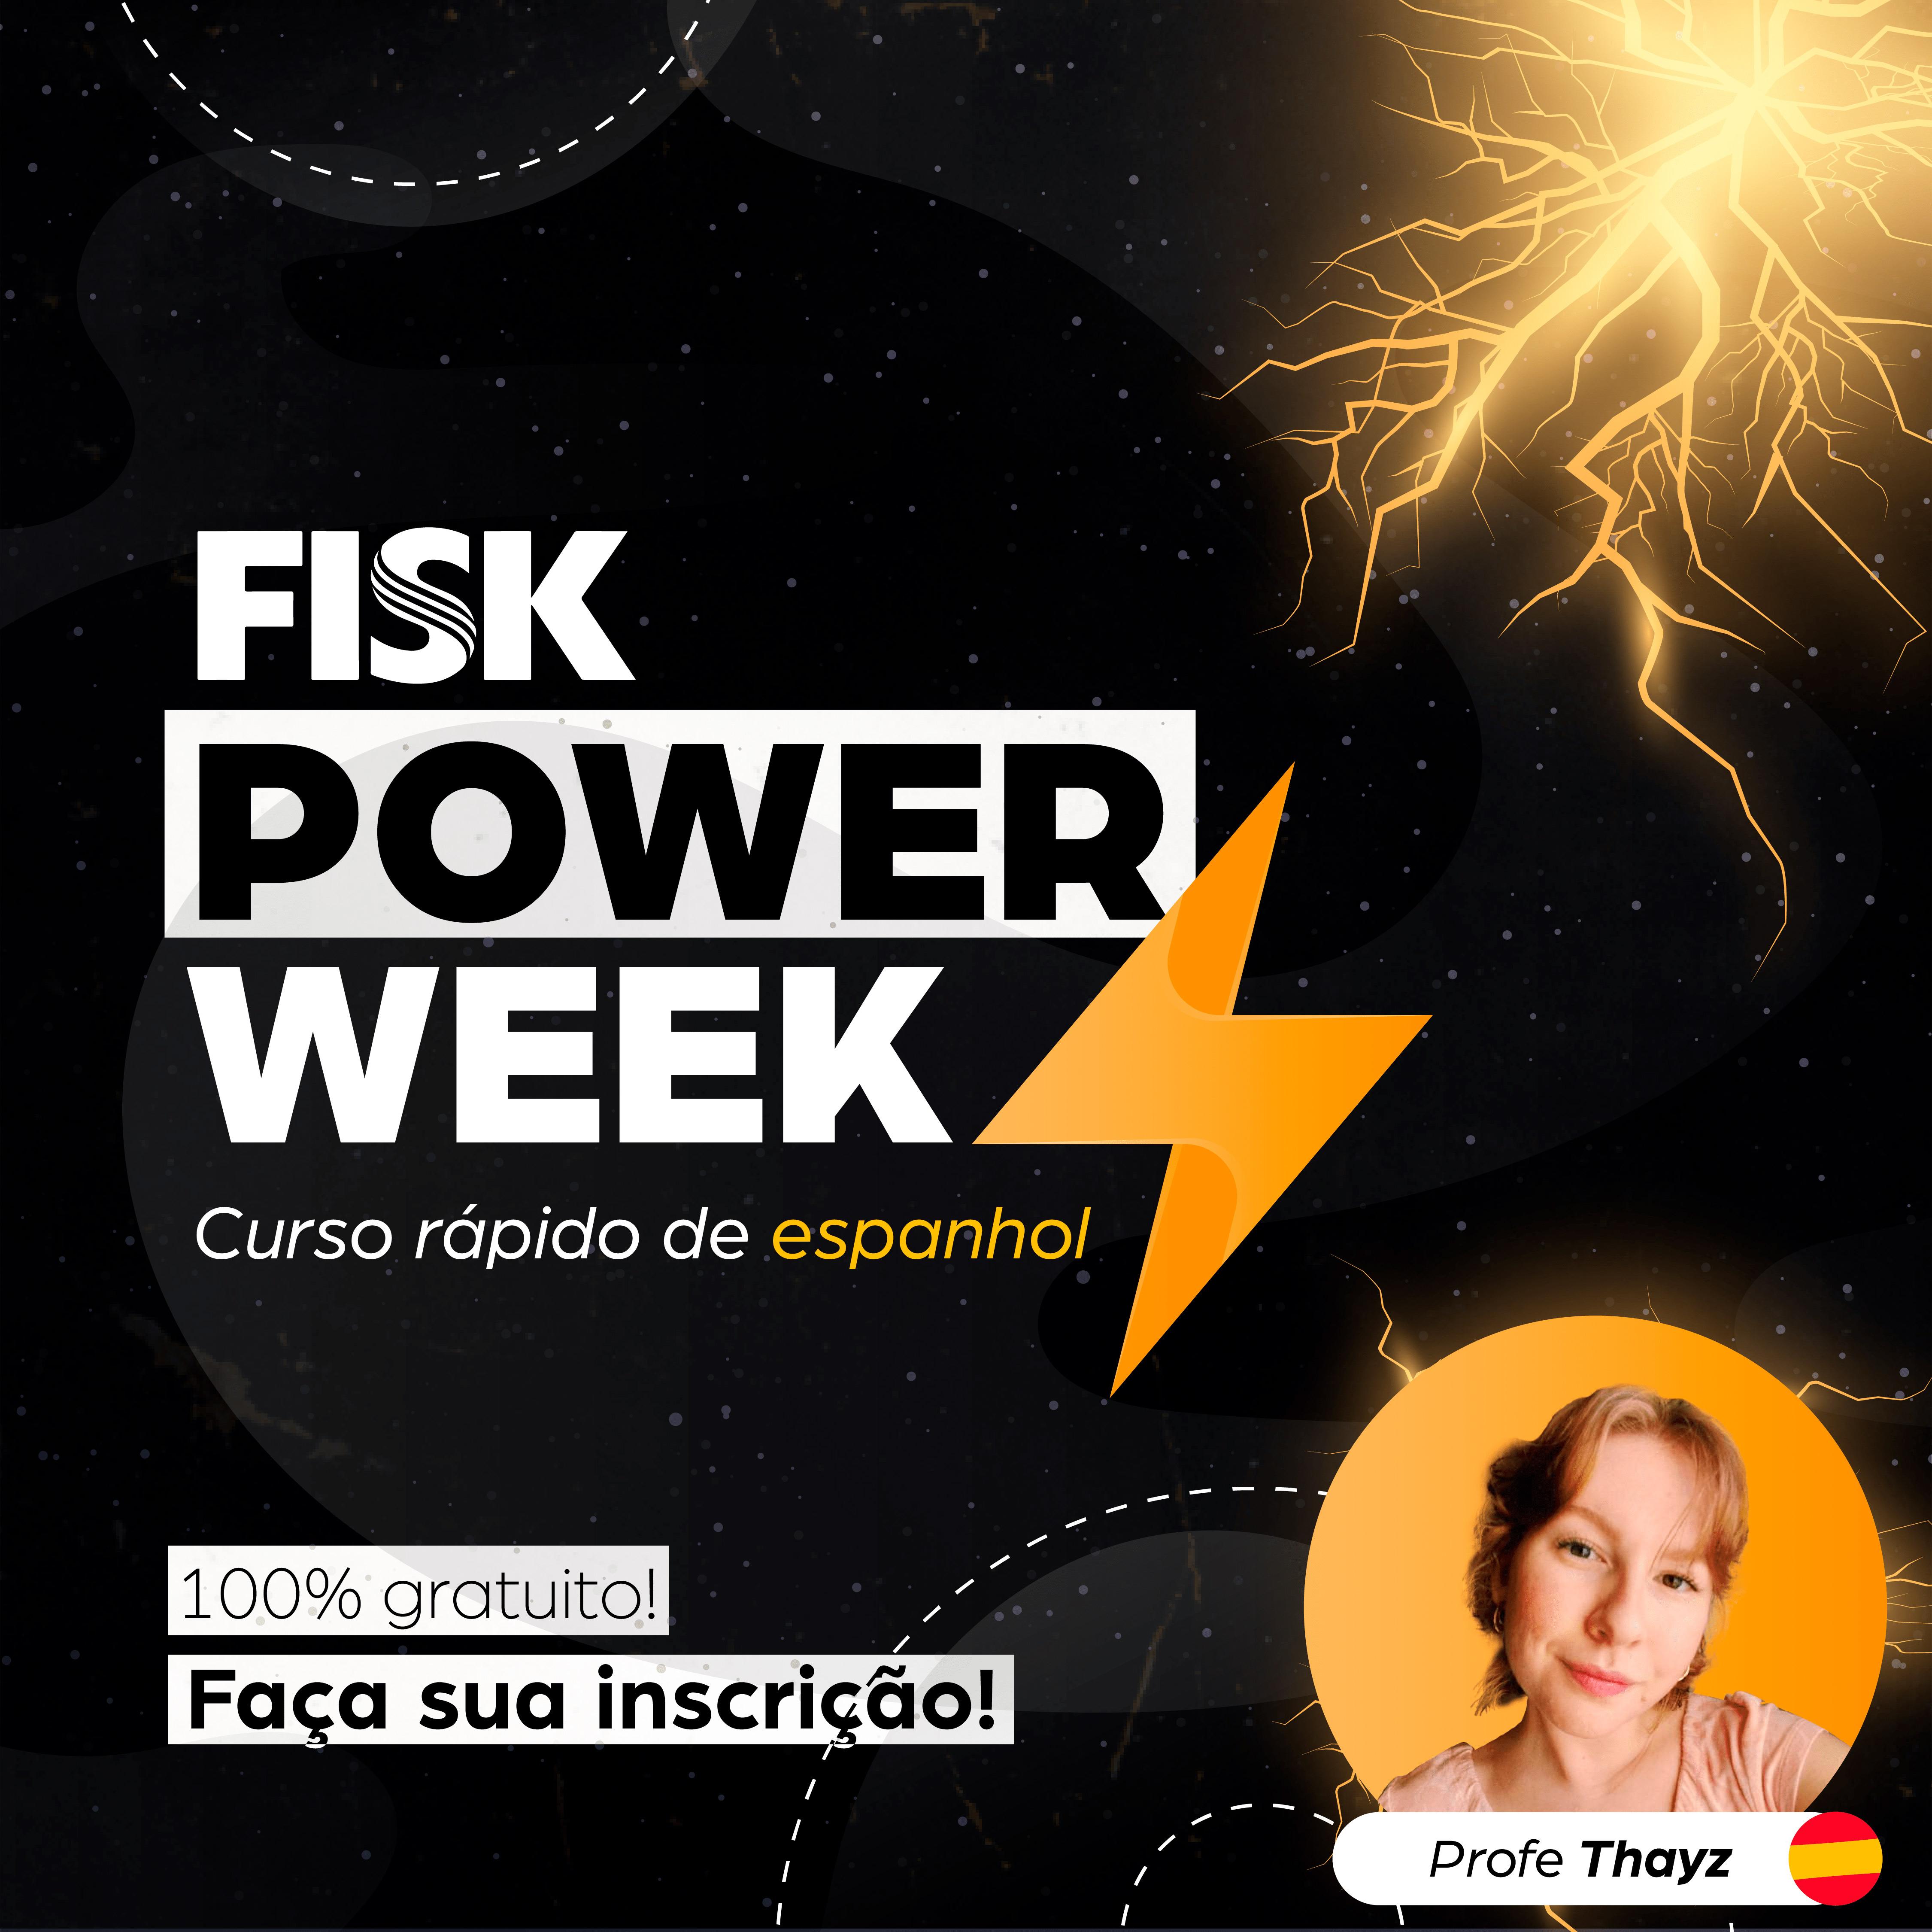 Fisk Caçapava e Taubaté/SP - Power Week